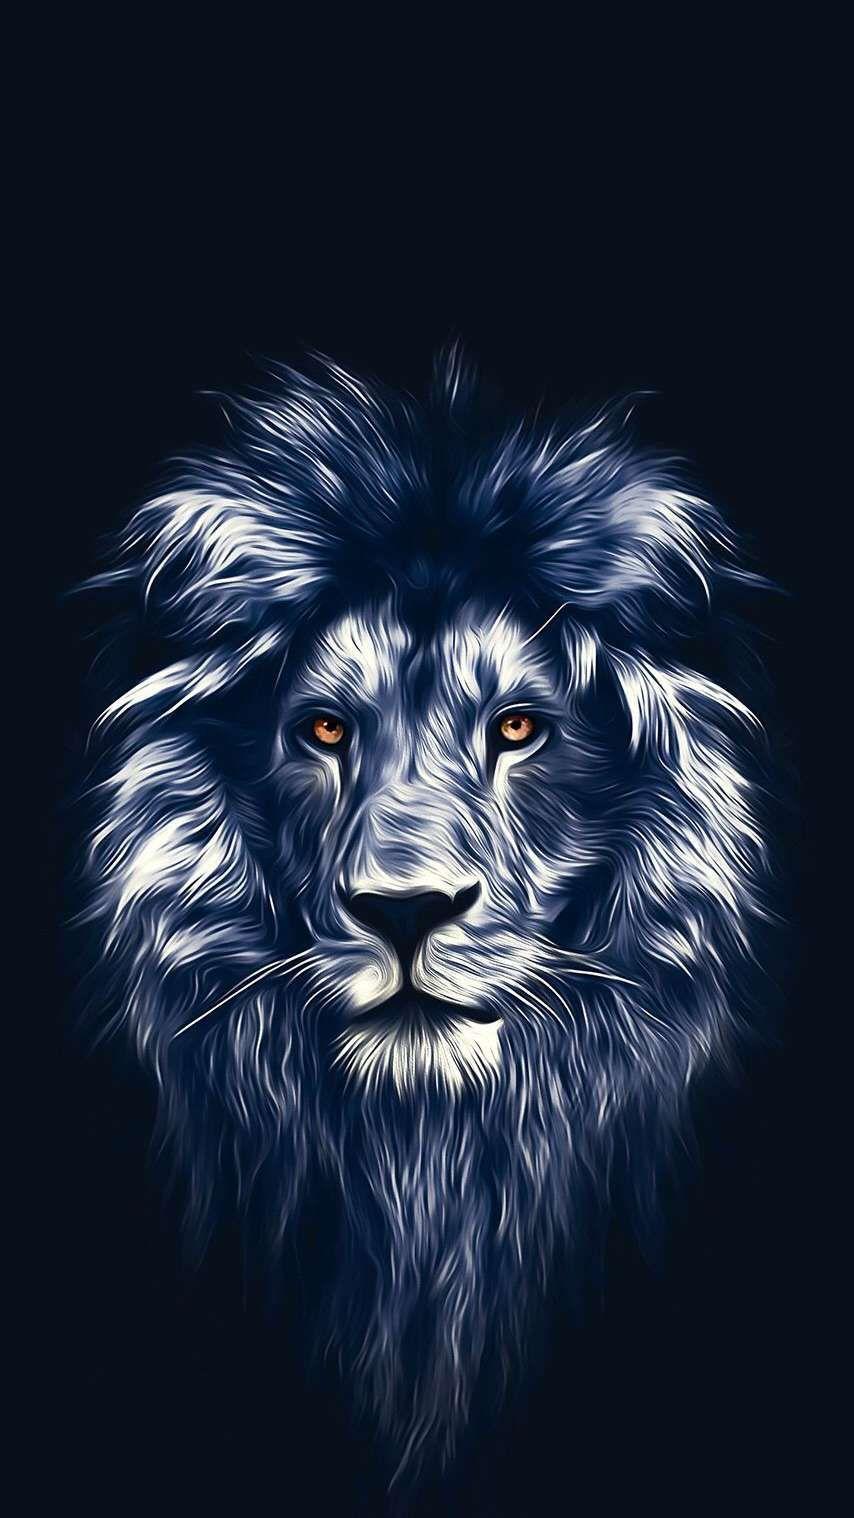 Lion Art Wallpapers Wallpaper Cave